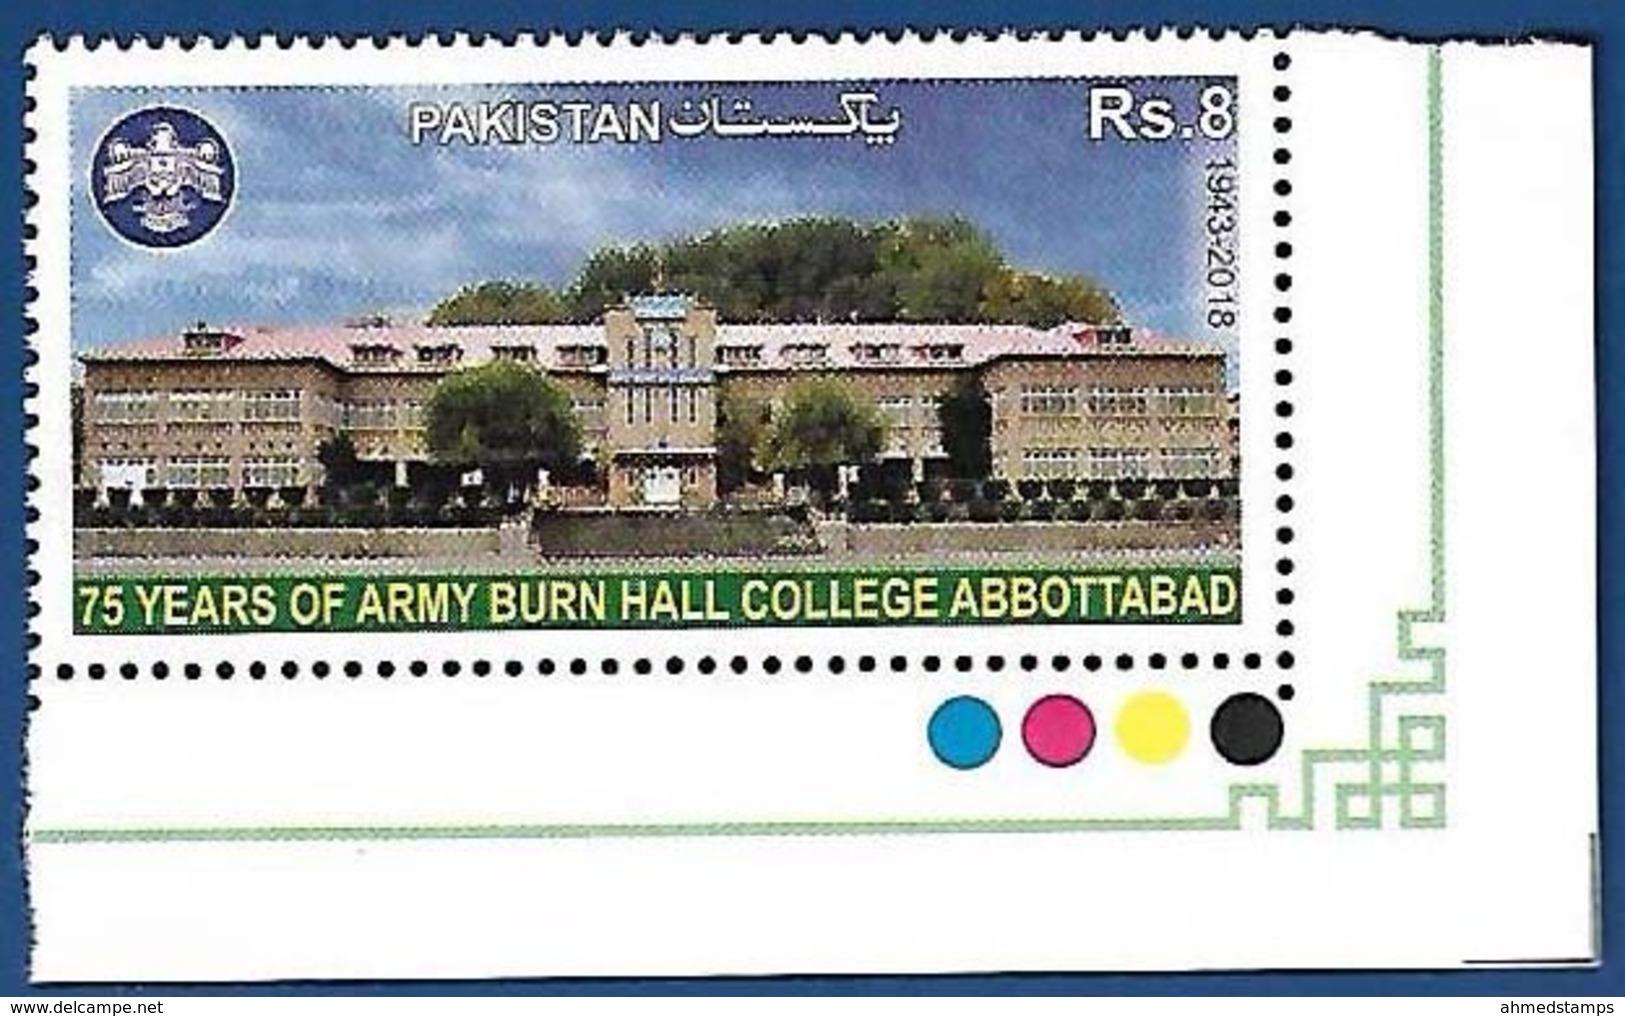 PAKISTAN MNH 2018 75 YEARS OF ARMY BURN HALL COLLEGE - Pakistan